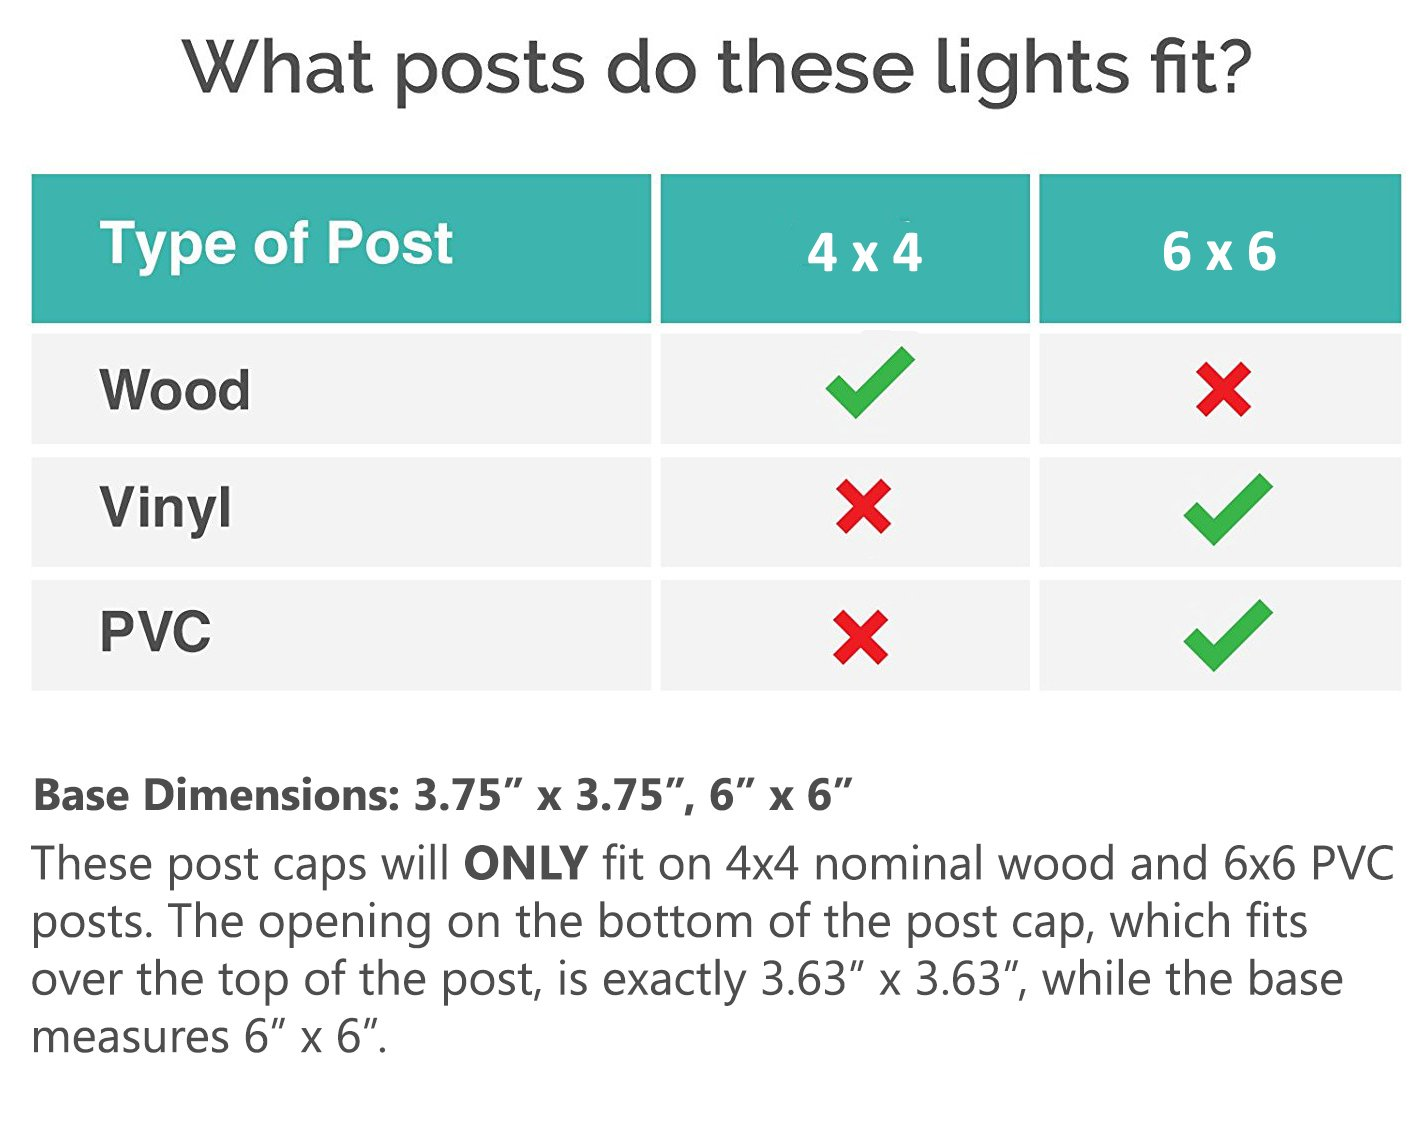 GreenLighting Bronze Aluminum Solar Post Cap Light 4x4 Wood & 6x6 PVC (2 Pack) by GreenLighting (Image #3)